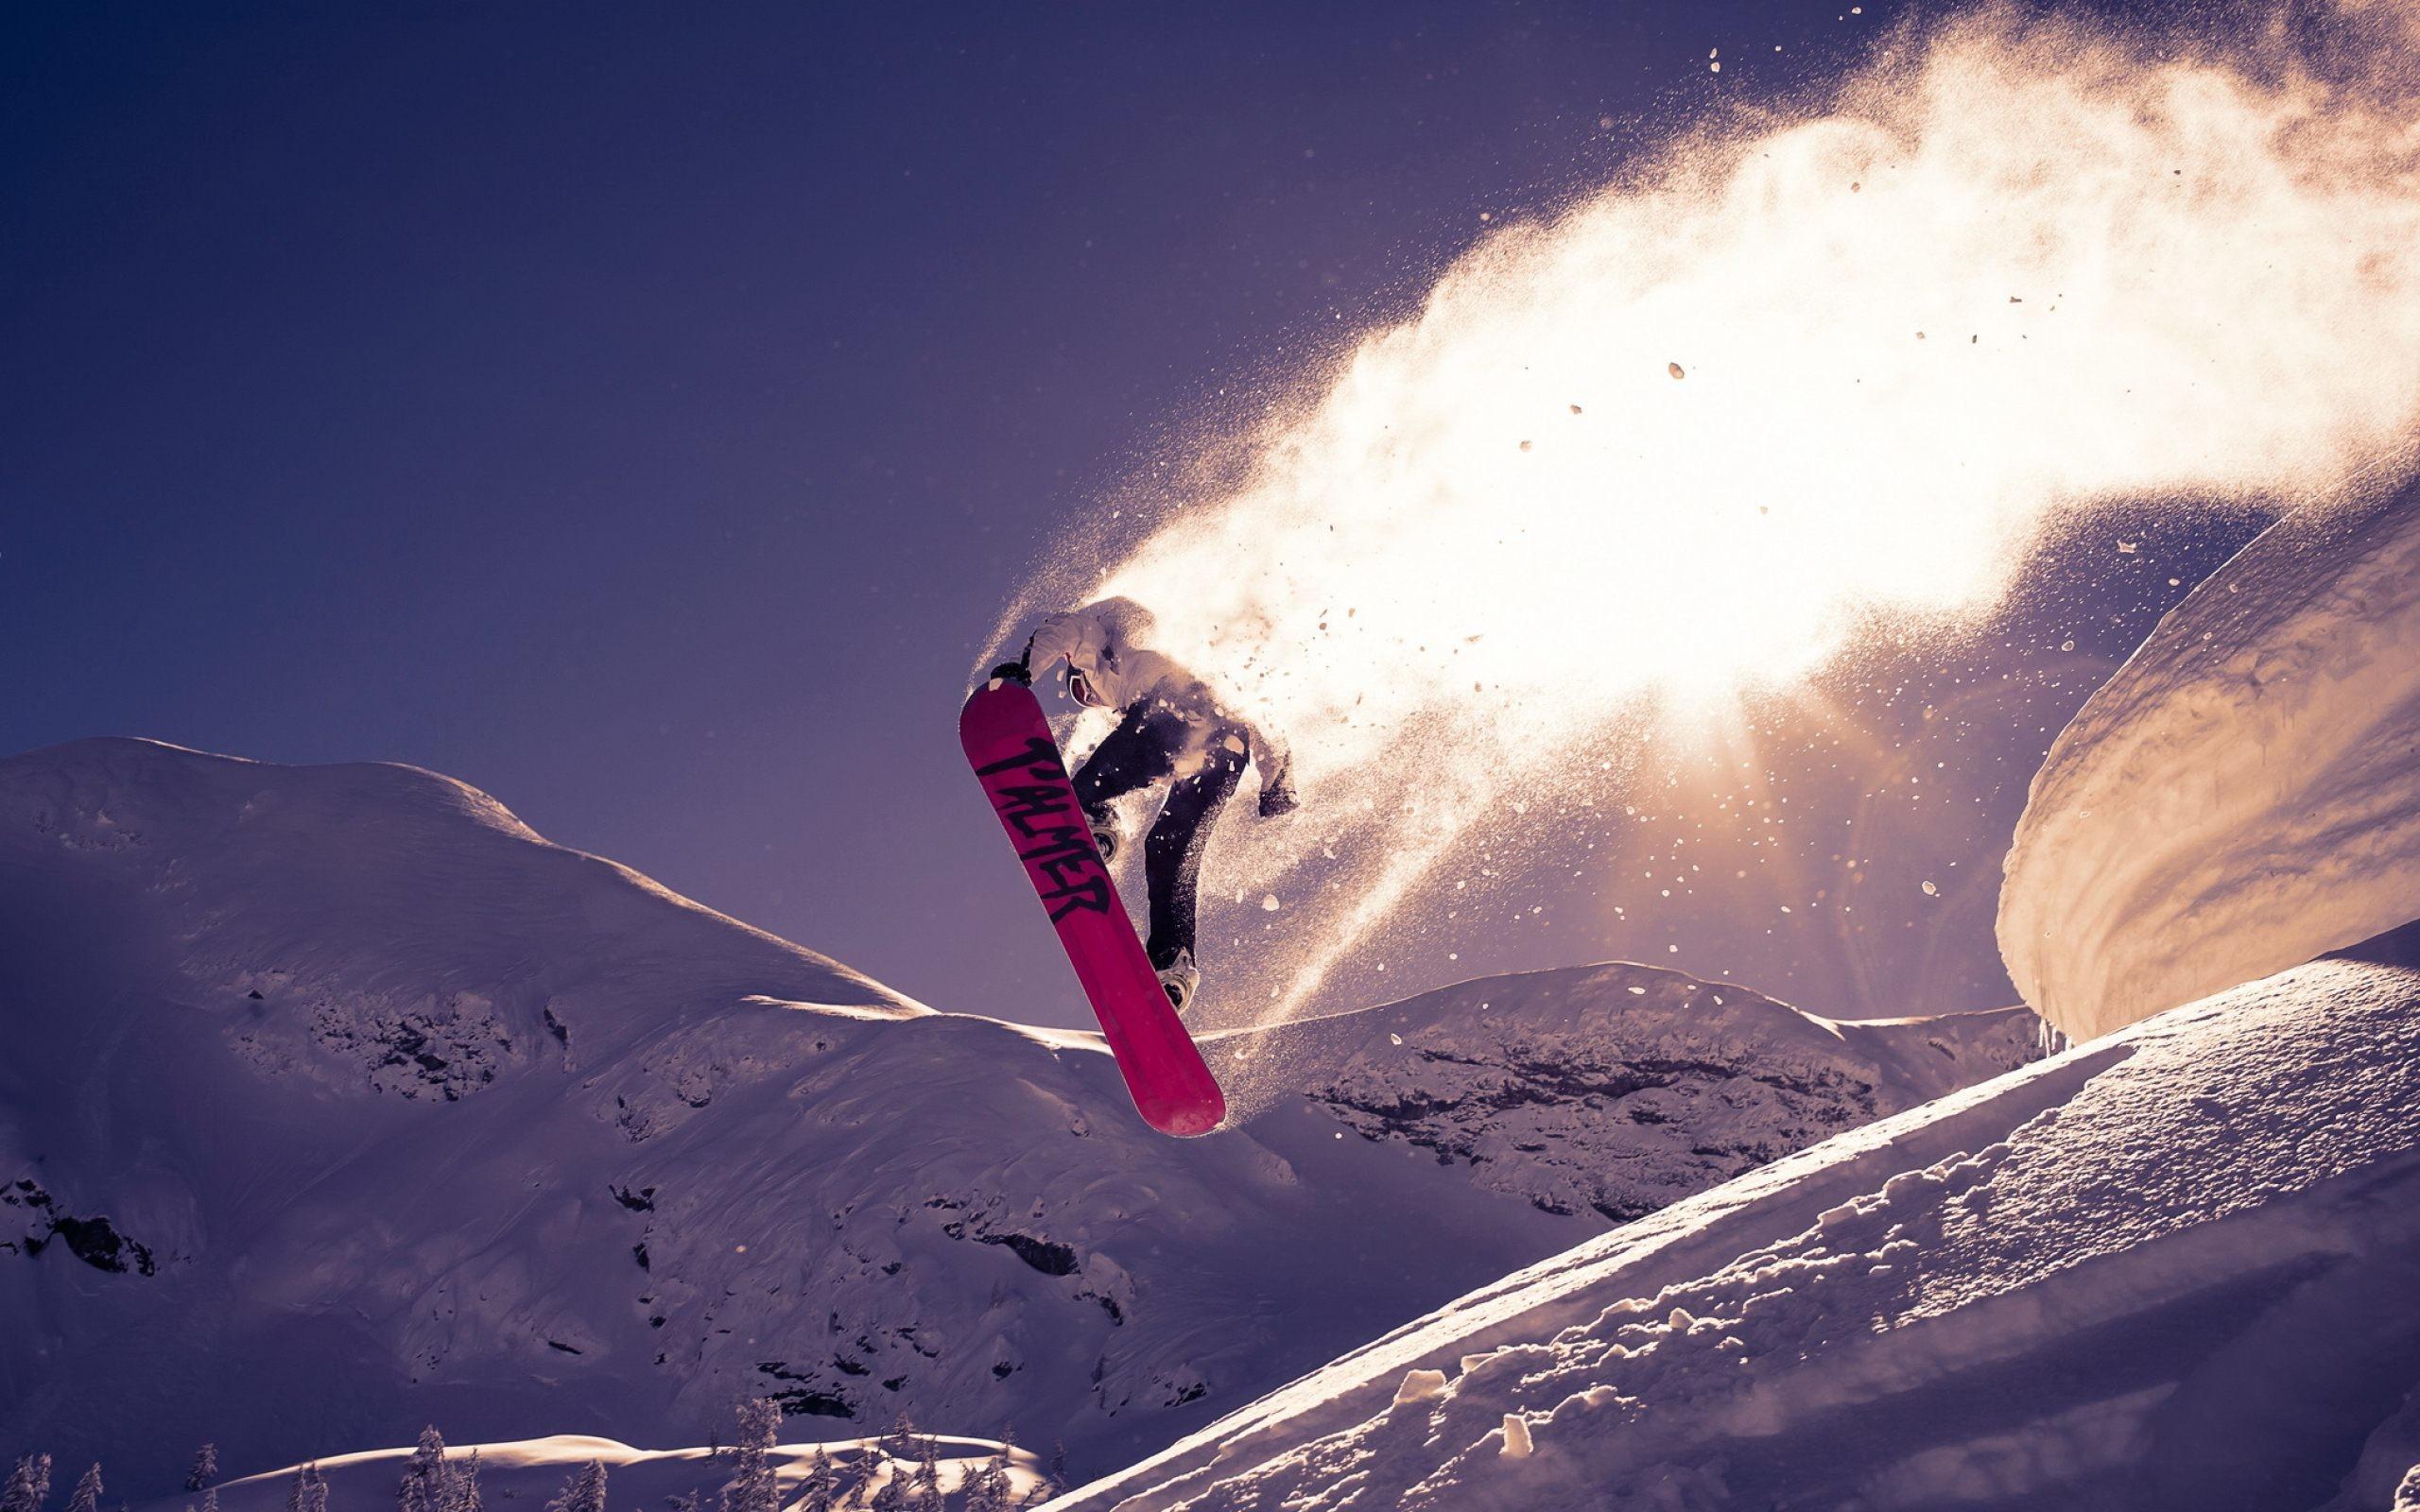 0 Snowboarding Wallpaper HD Wallpaper Zone Snowboarding Wallpaper HD  Download Of Sports Wallpaper